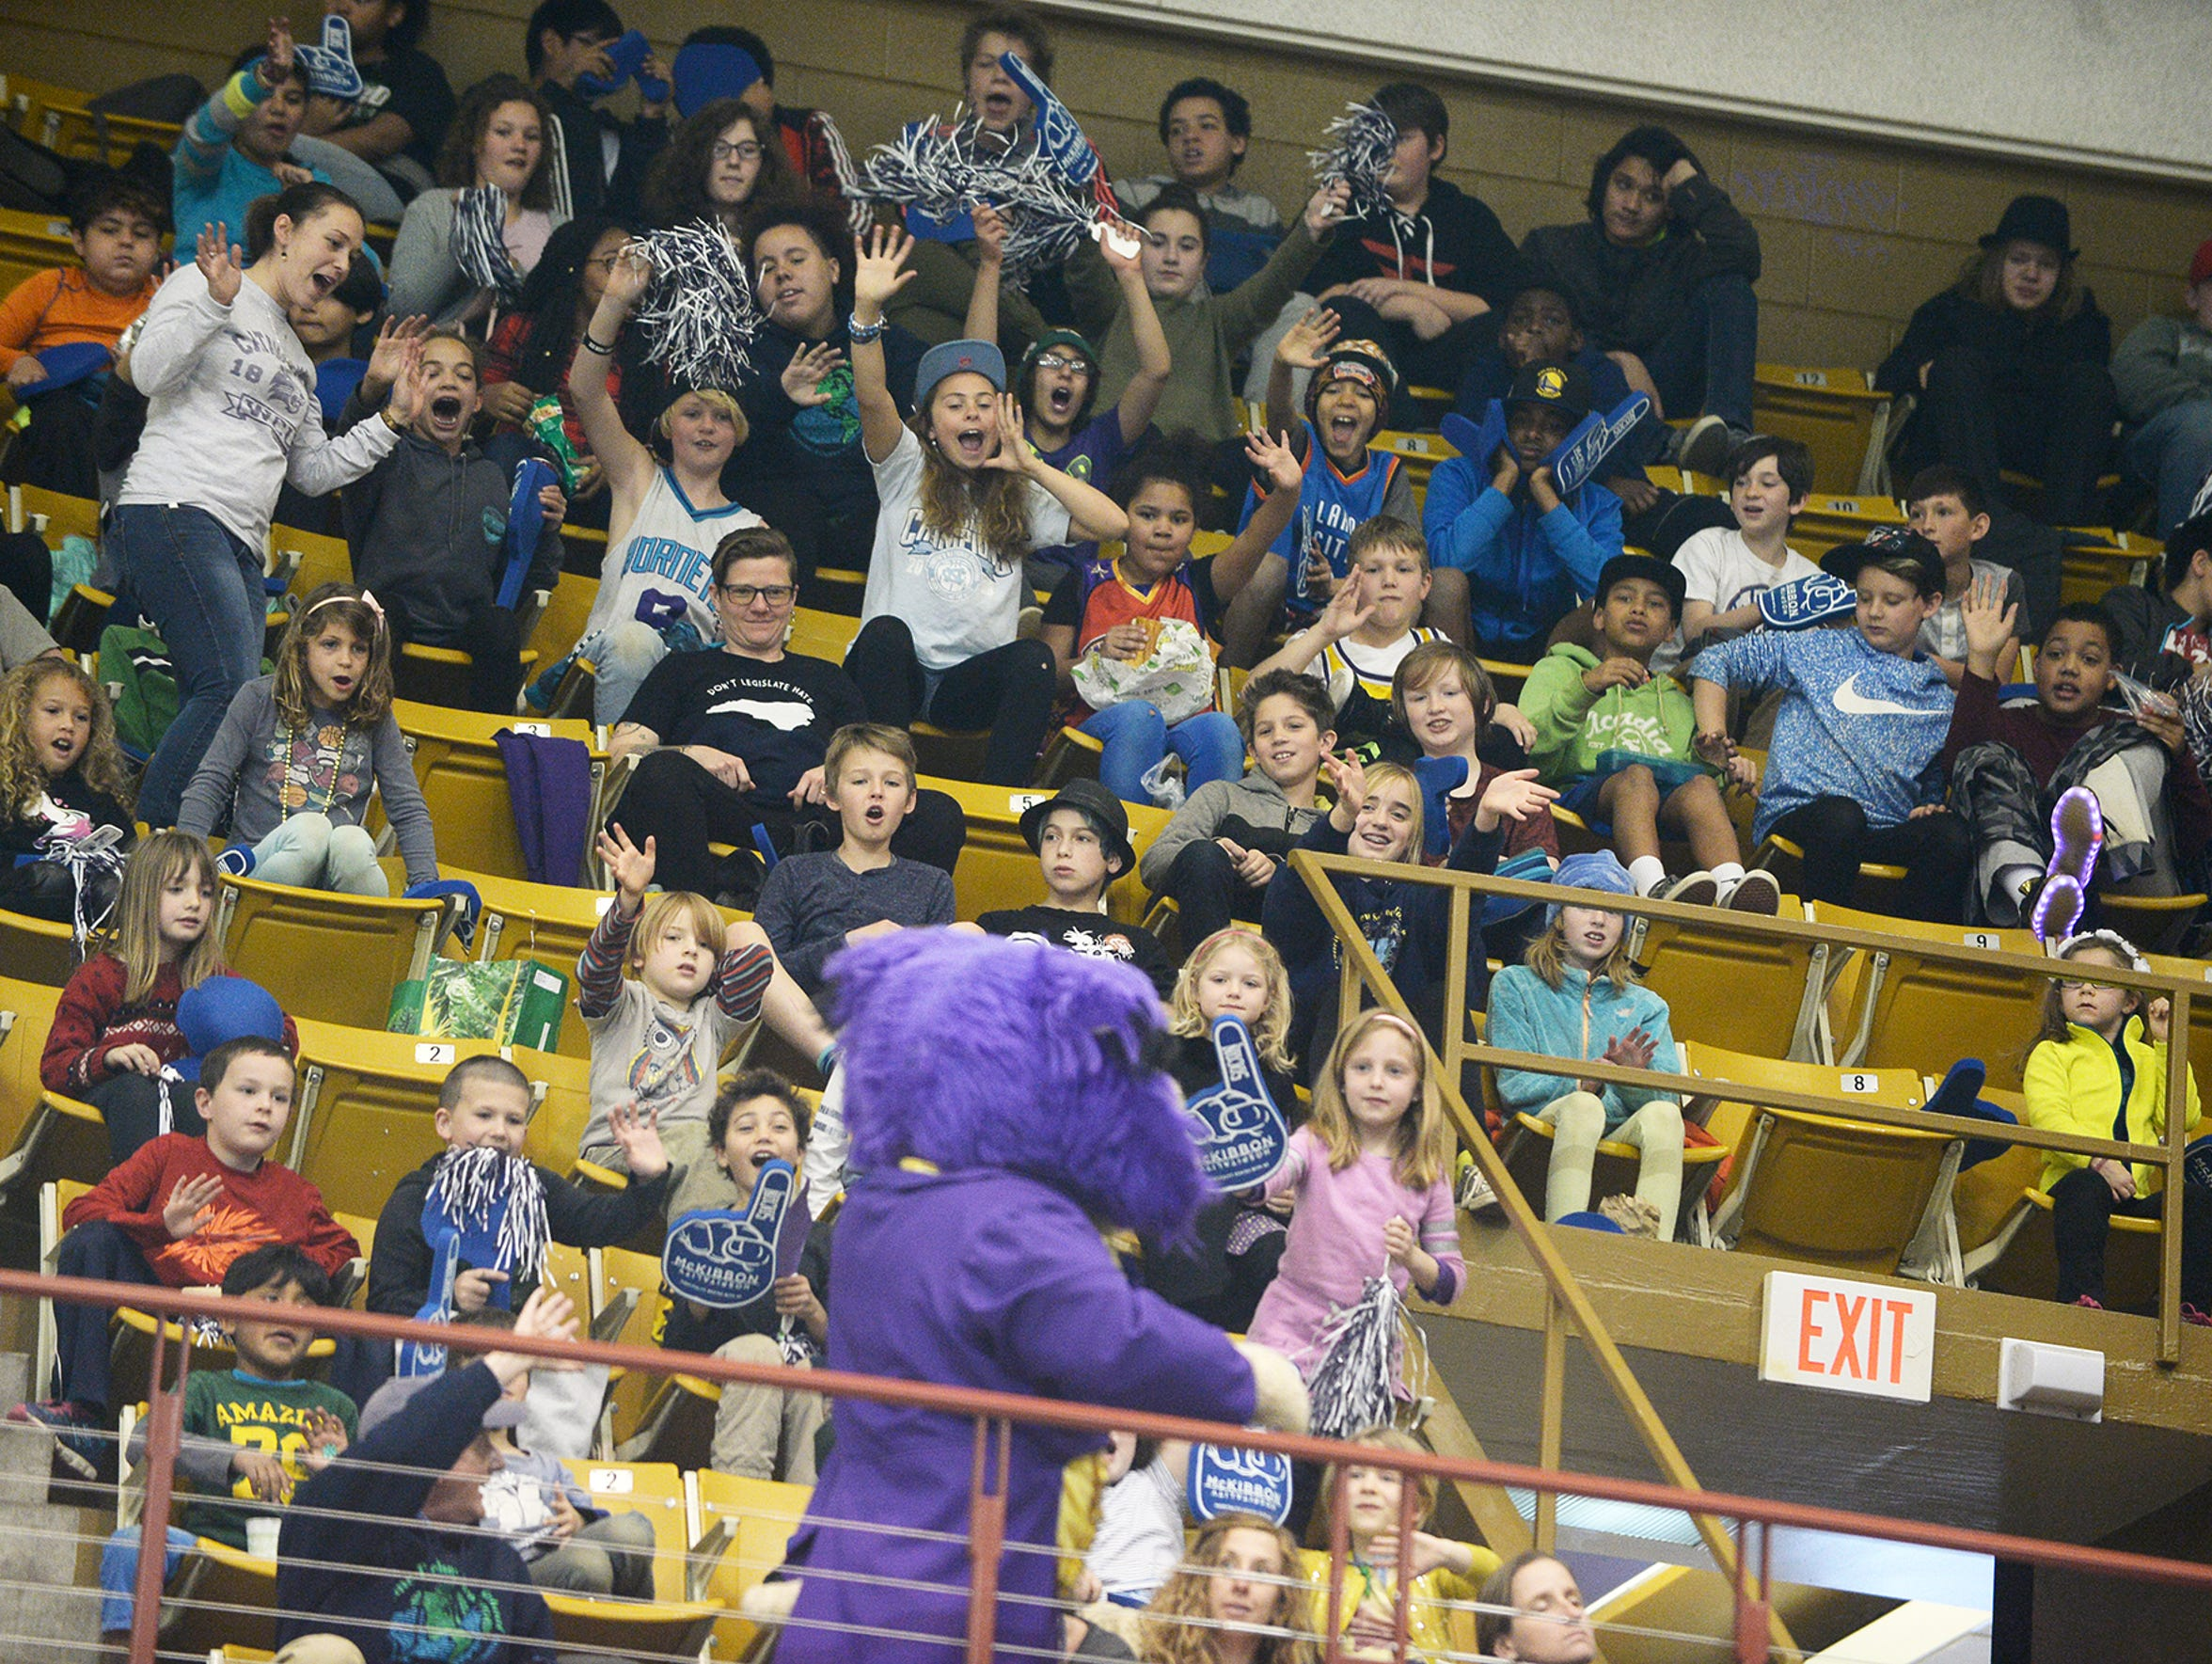 Basketball fans wave and shout at Western Carolina's